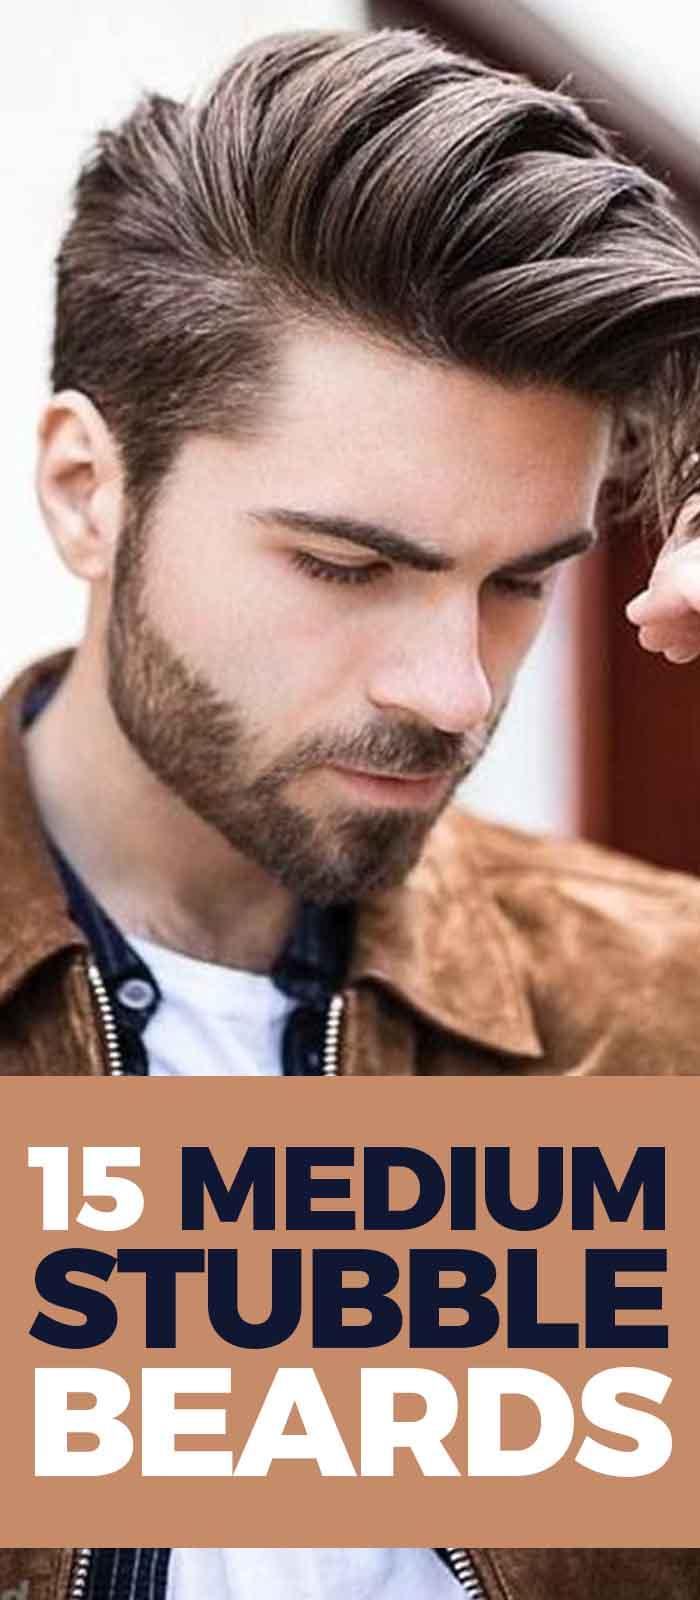 Brown Jacket Look For men With Medium Stubble Beard!